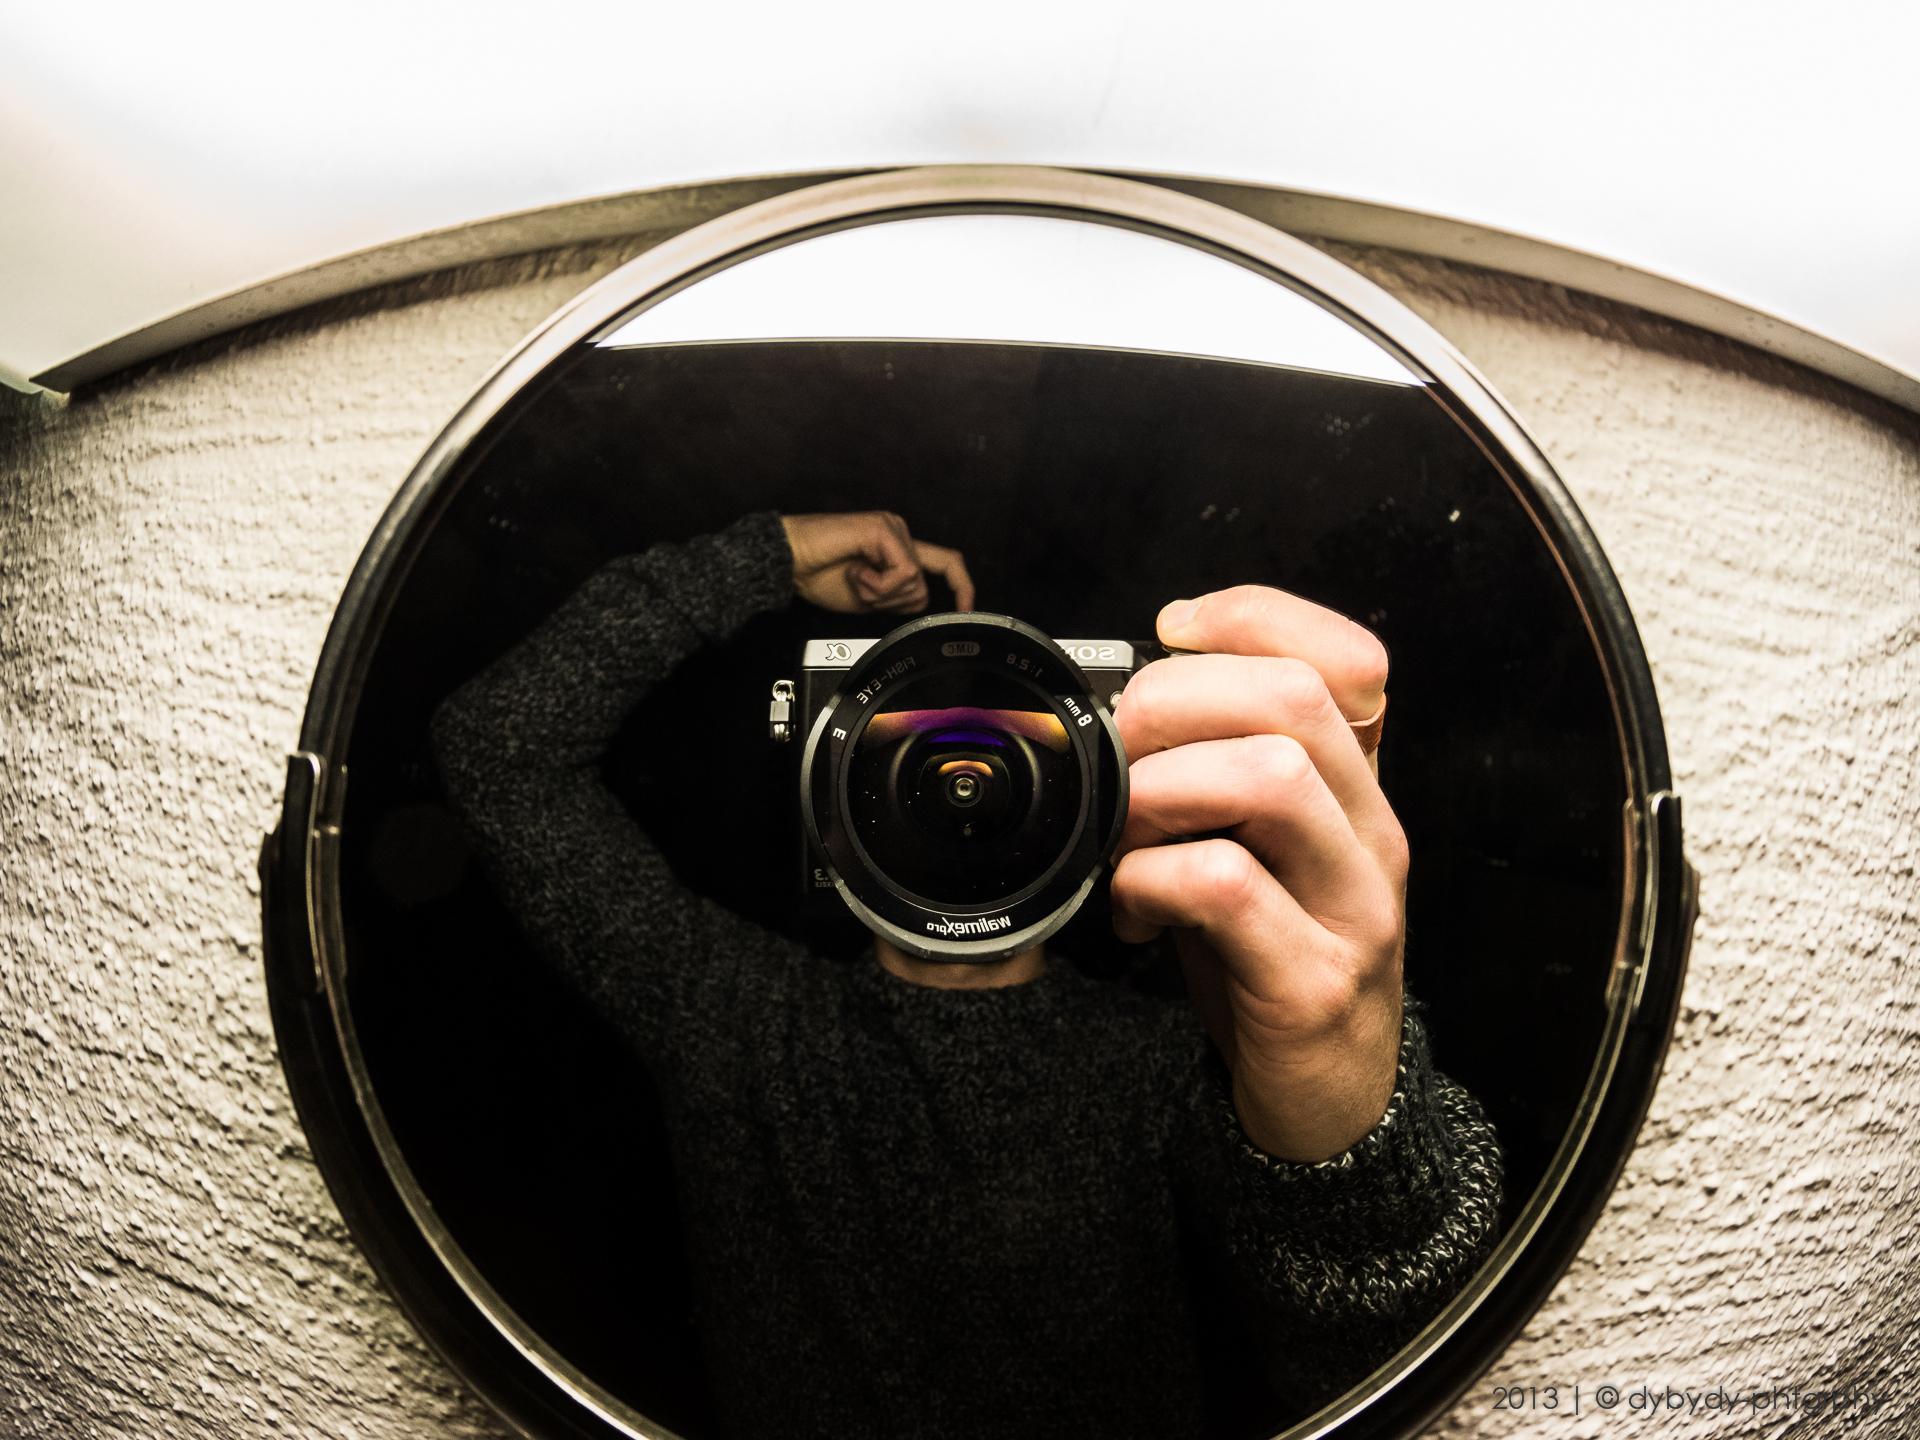 lens head  - sony nex 7 | walimex pro 8mm f2.8 | f5.6 | ISO800 | 1/60